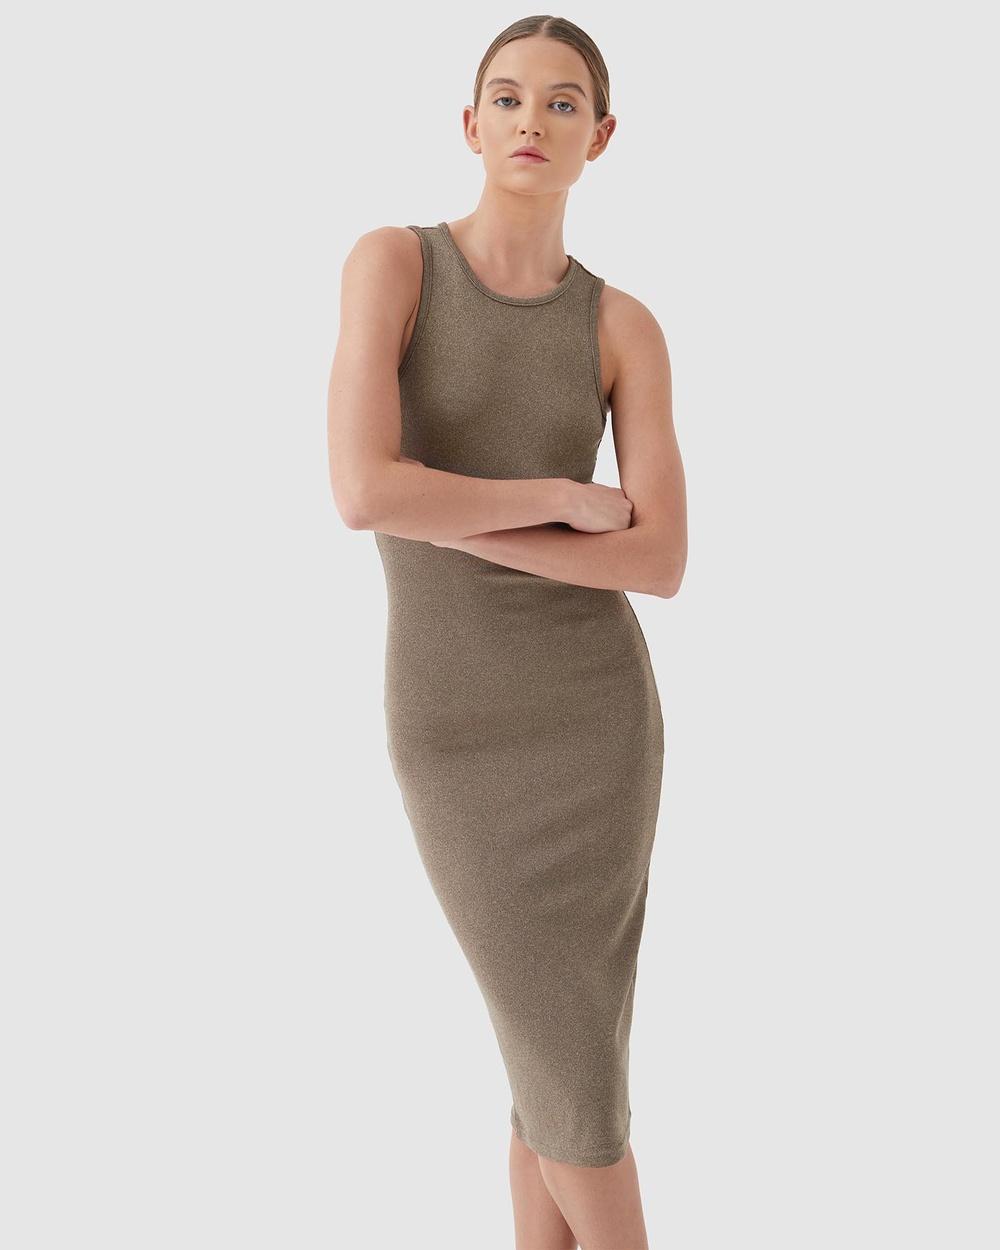 4th & Reckless Lucie Dress Bodycon Dresses Khaki Rib Jersey